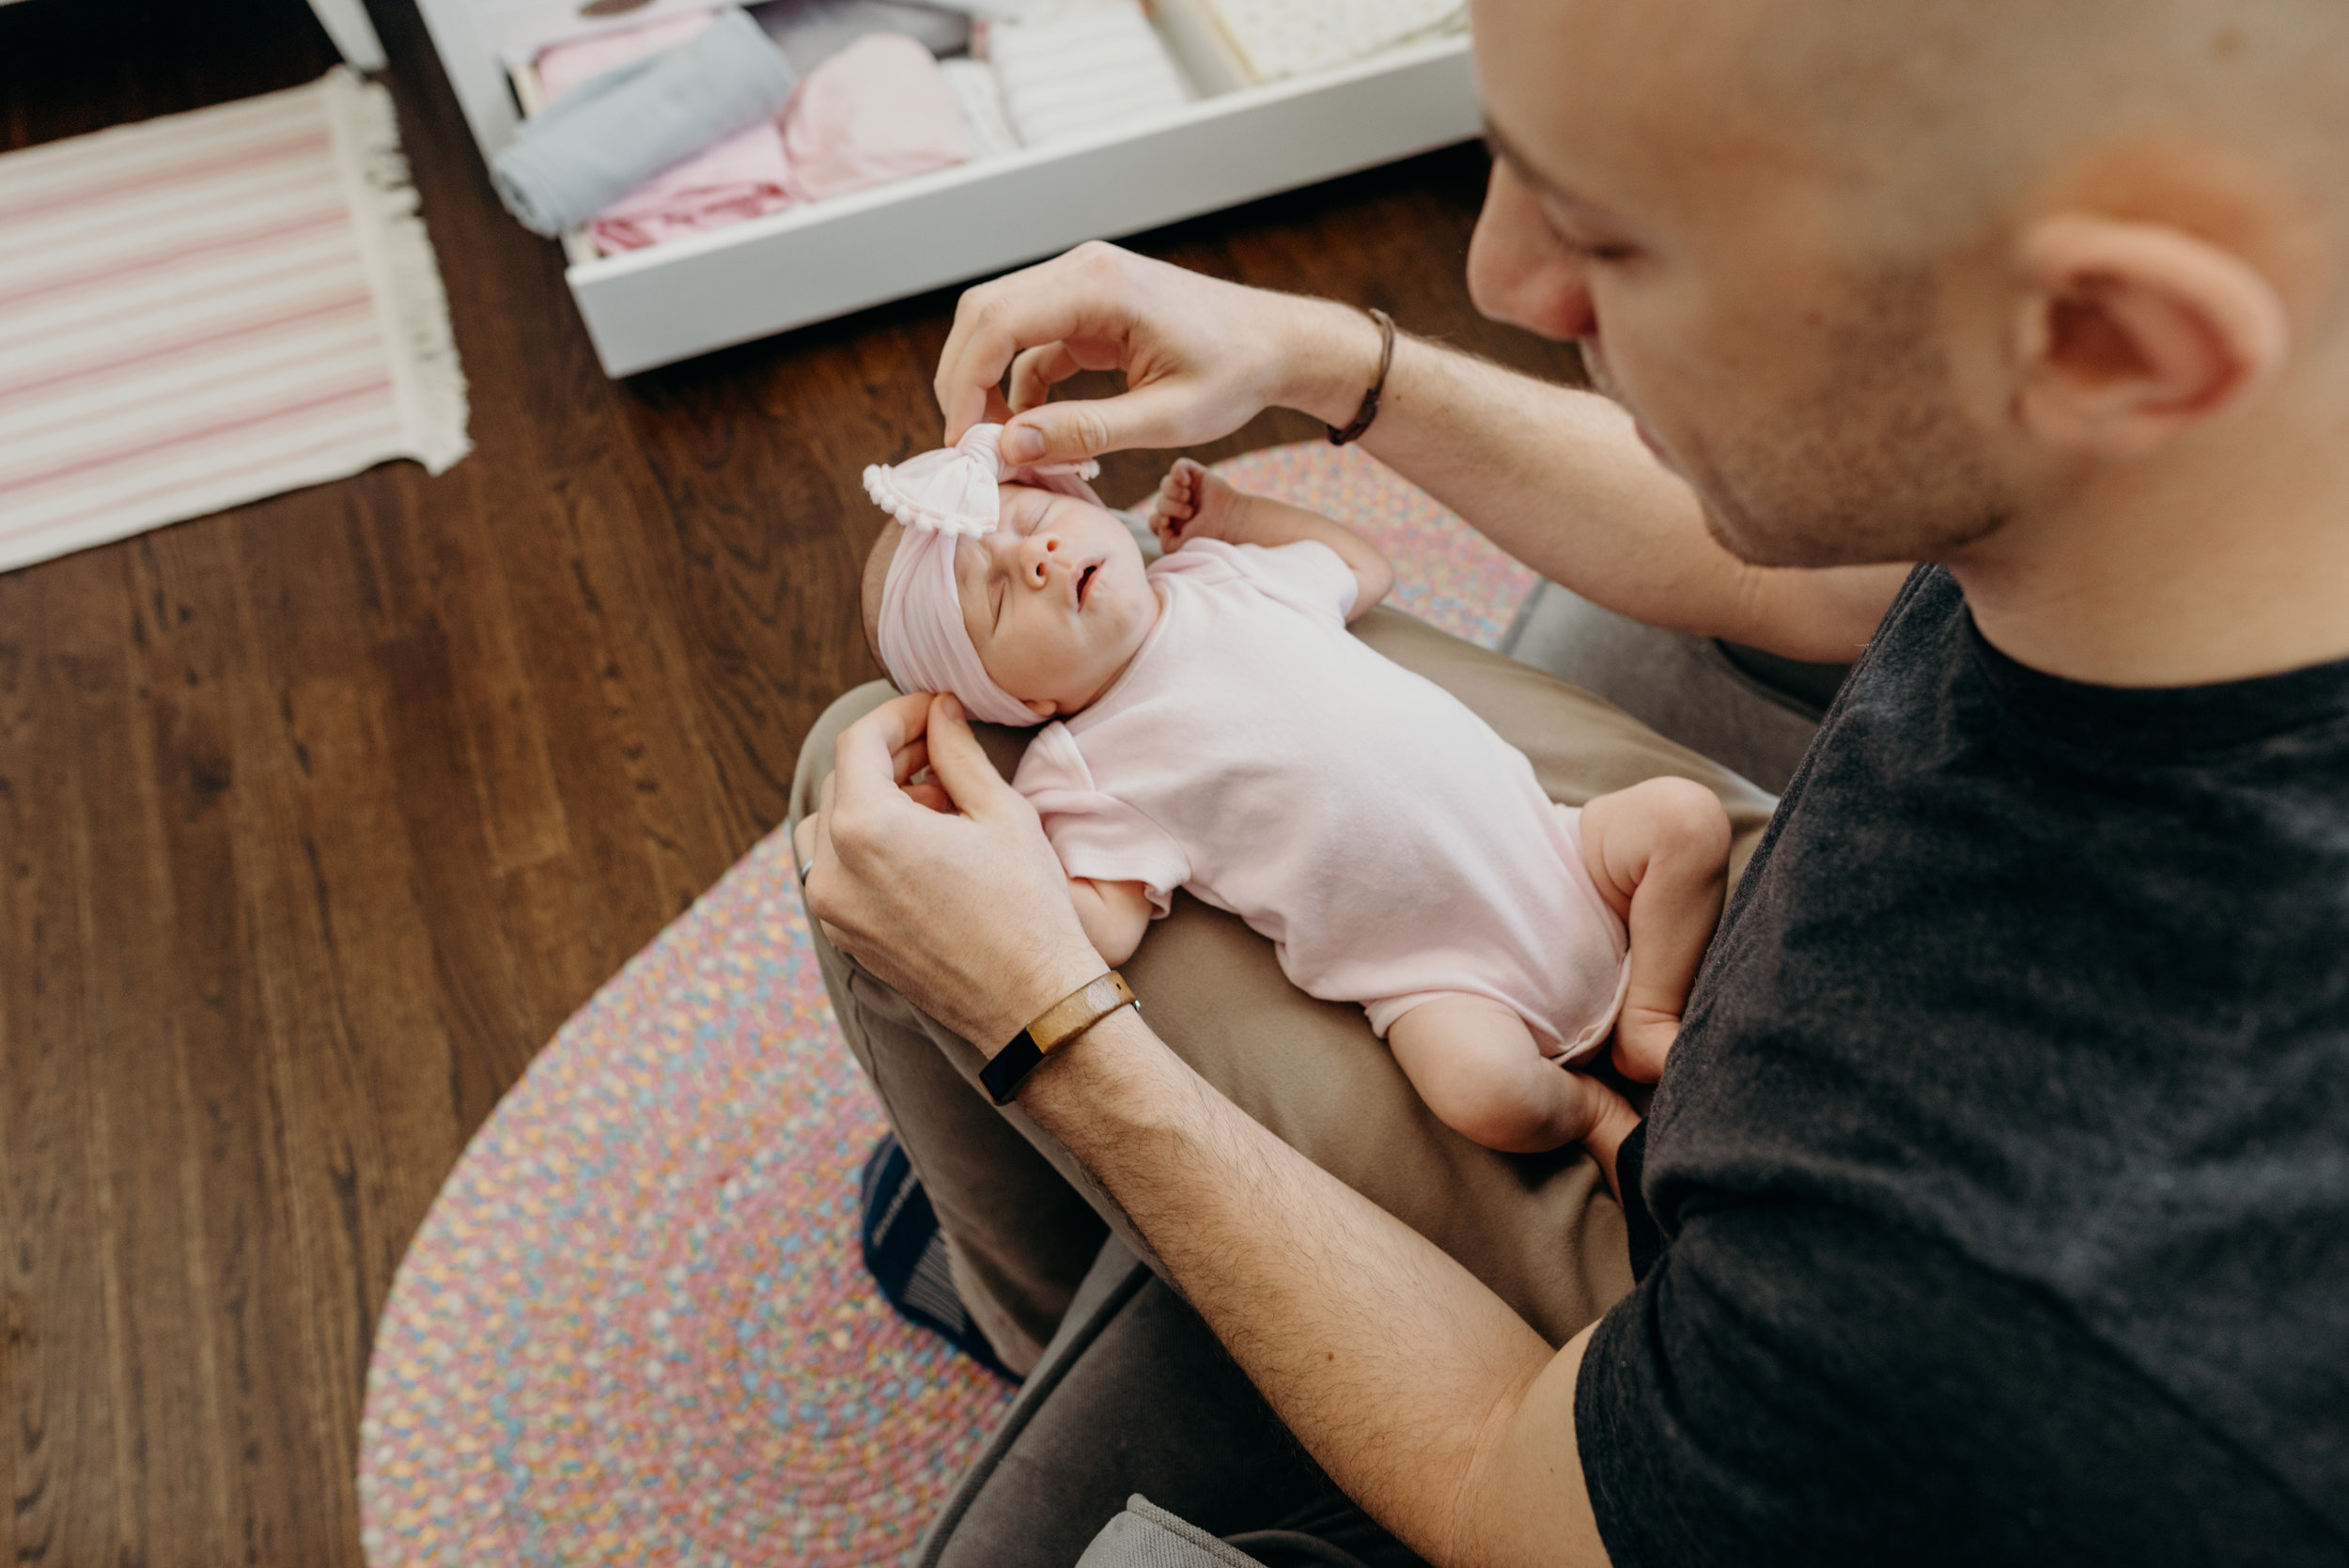 Newborn-at-home-lifestyle-photography-dc-5.jpg